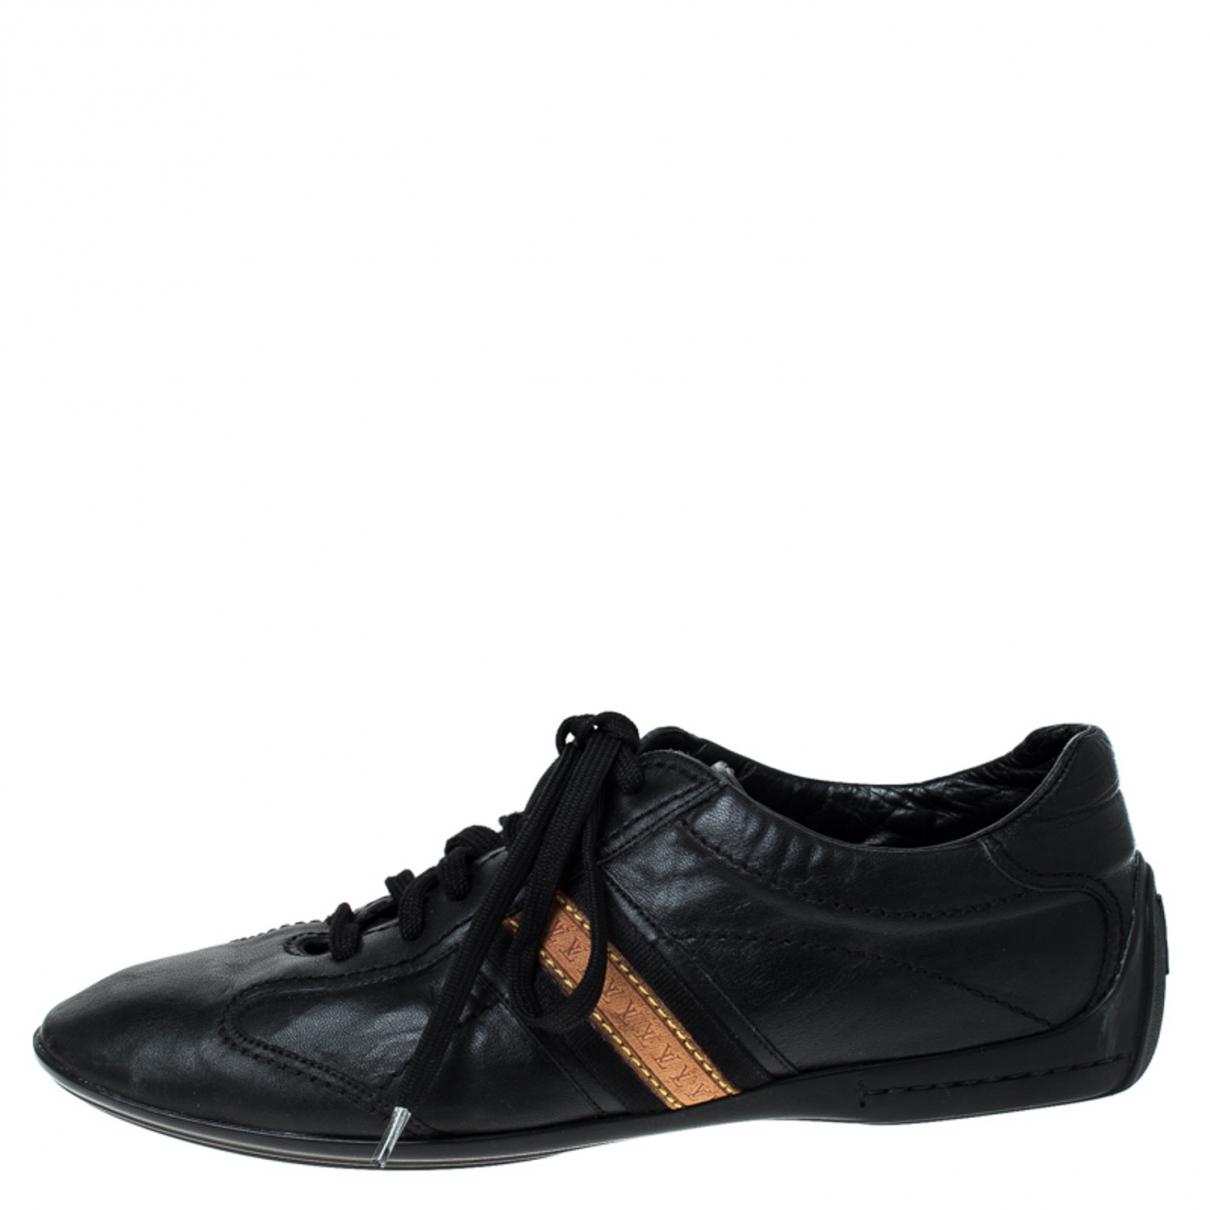 Louis Vuitton \N Sneakers in  Schwarz Leder